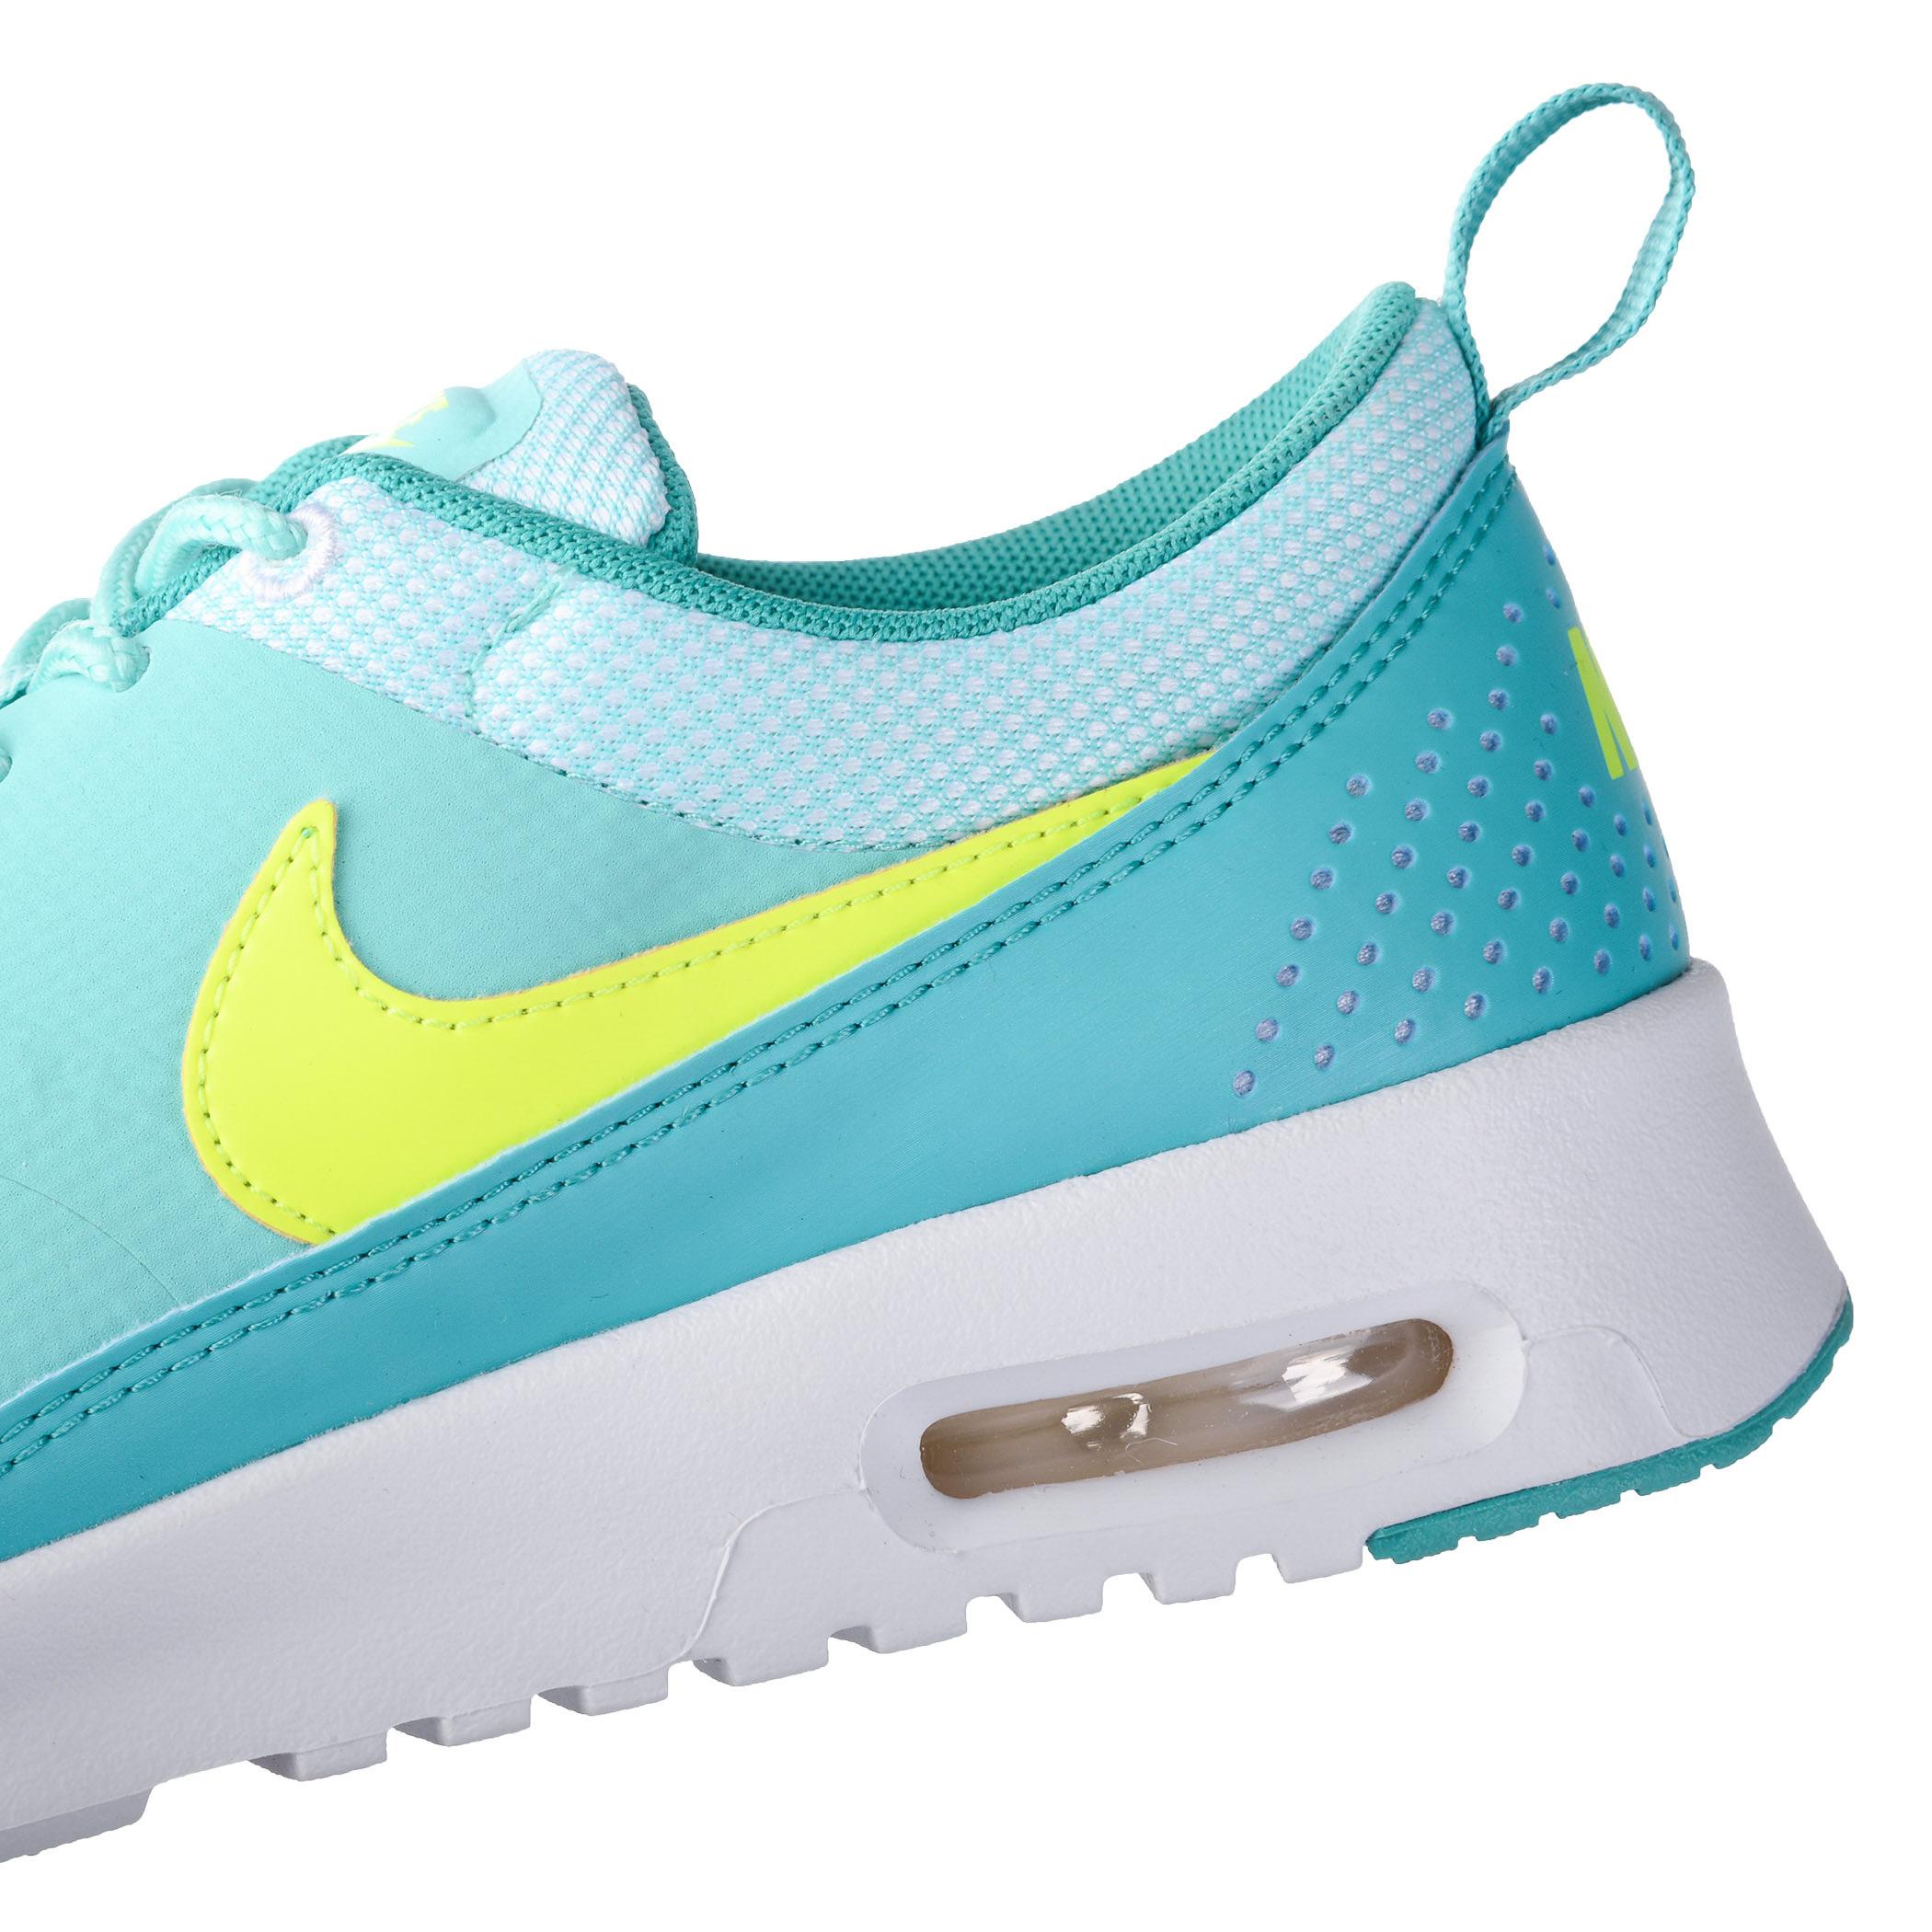 Подростковые кроссовки Nike Air Max Thea (GS) 814444 300